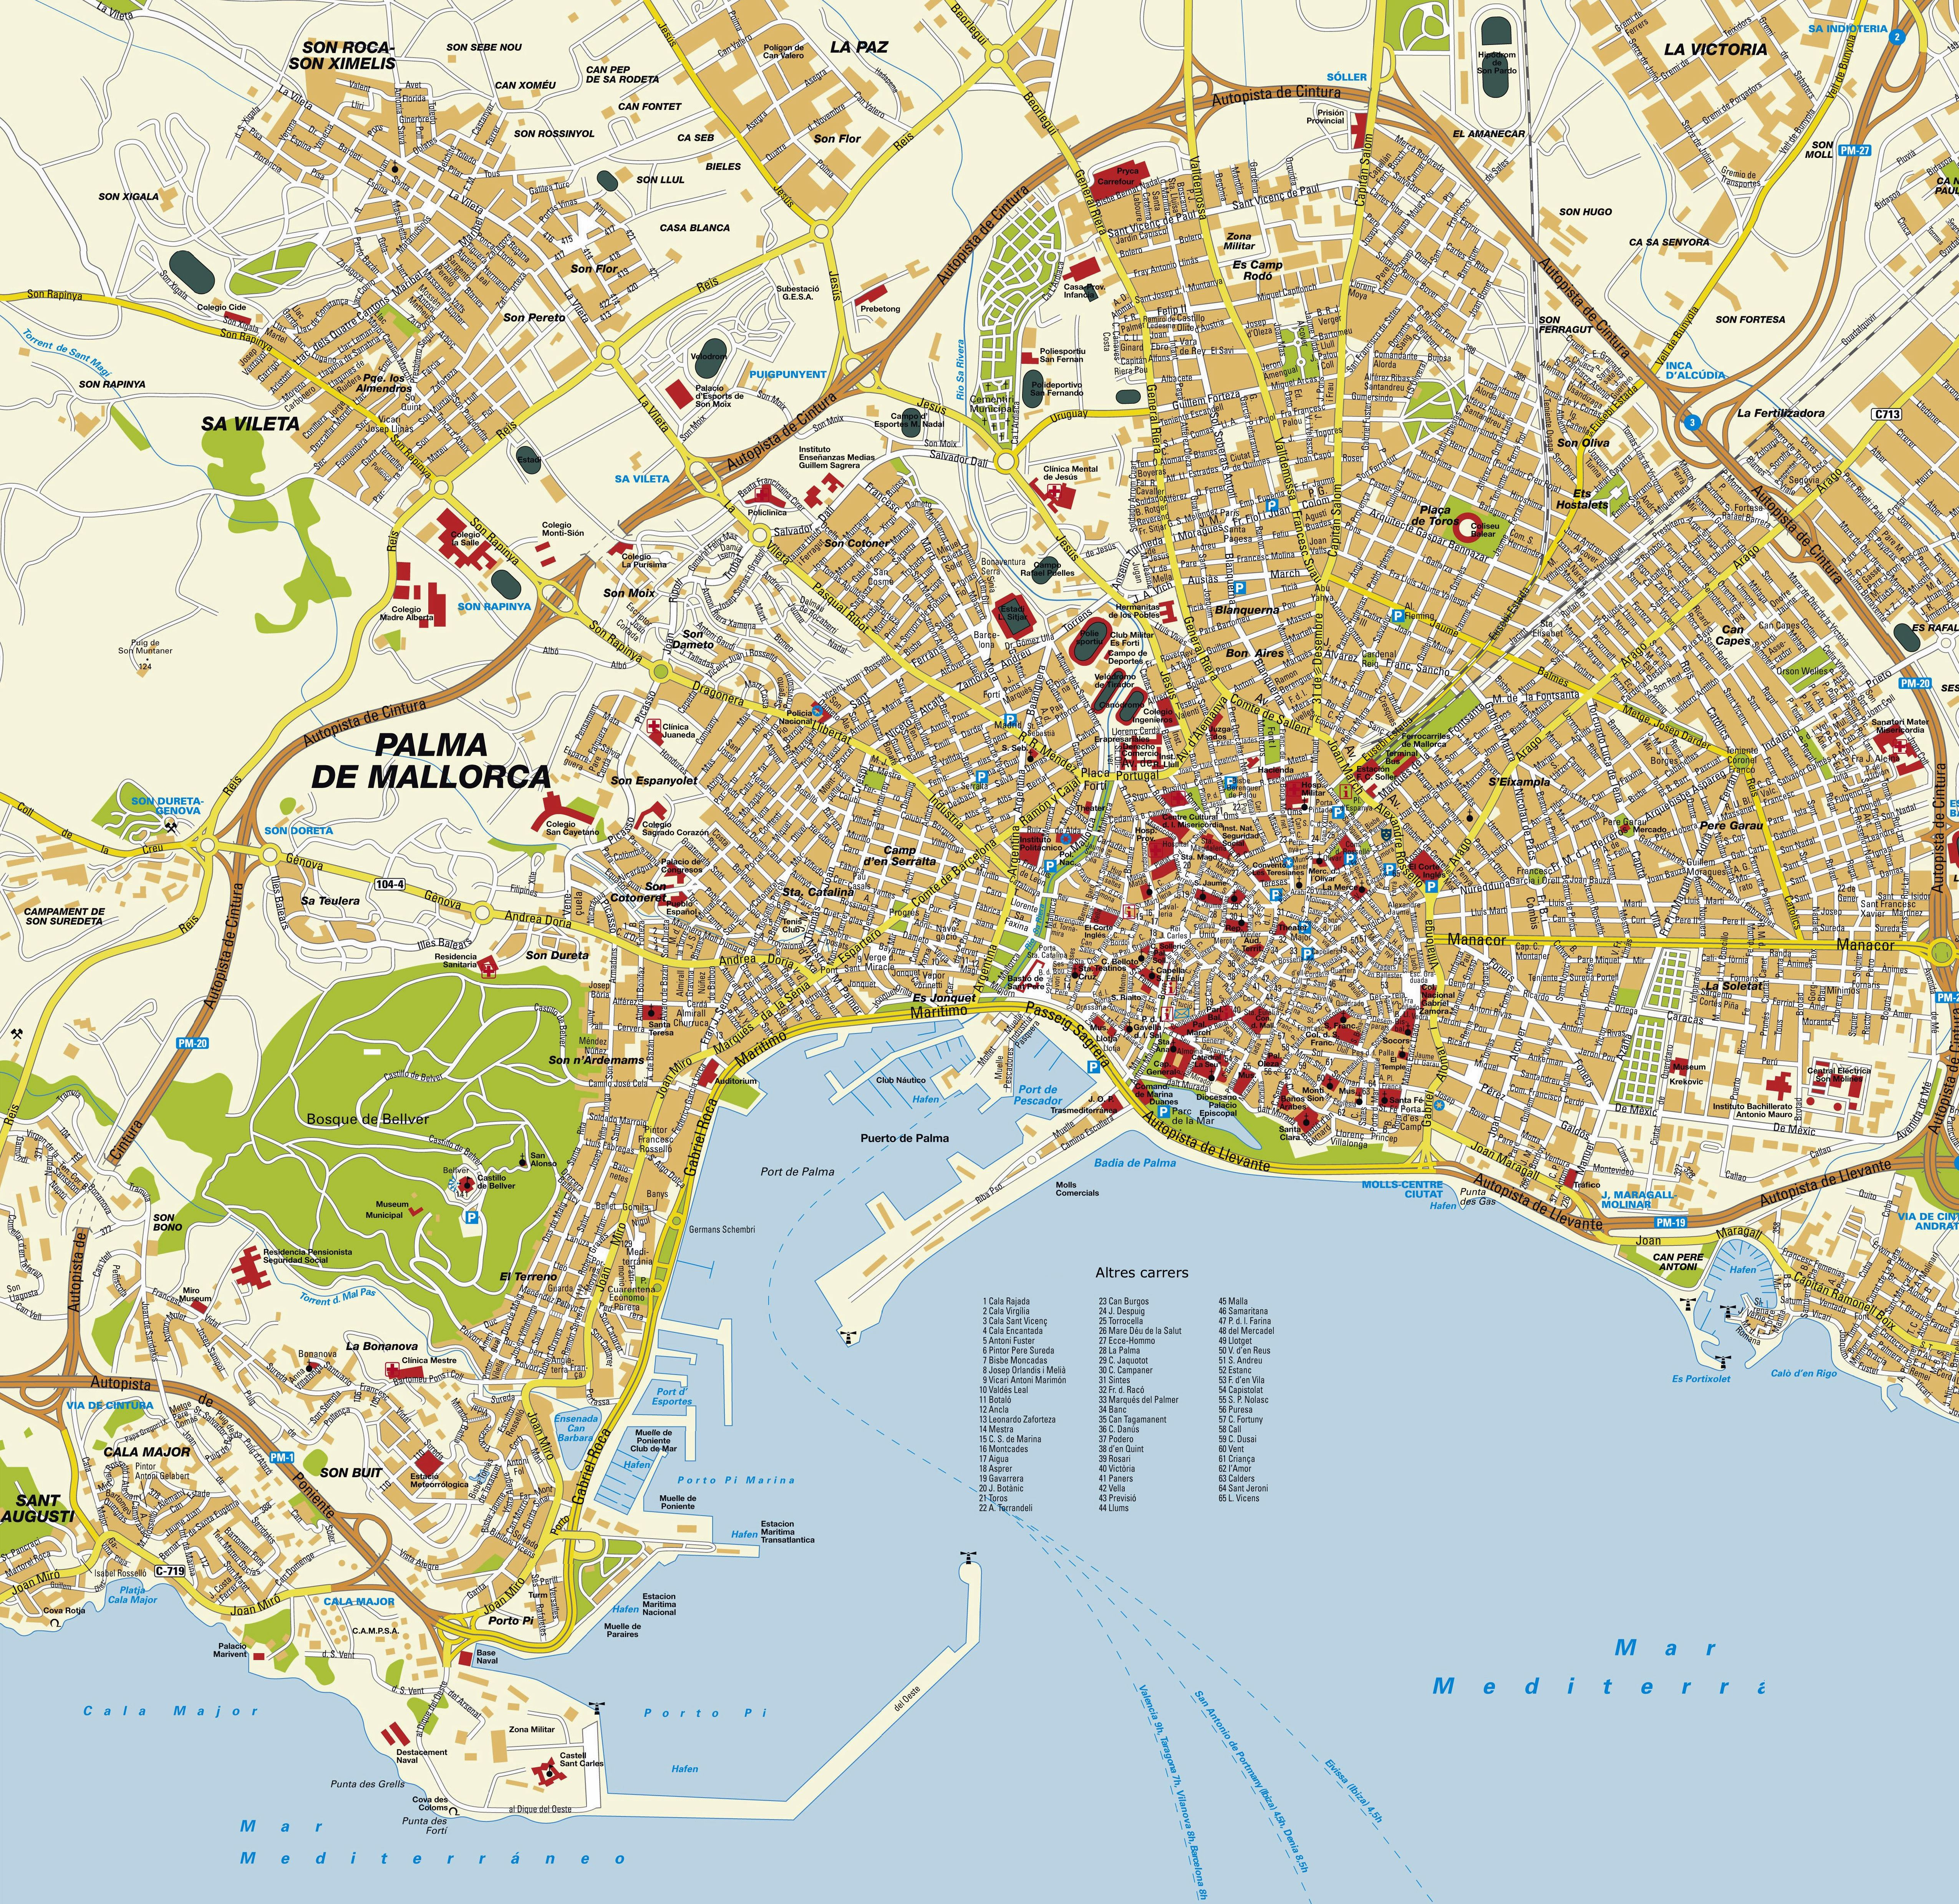 palma de maiorca mapa Large Palma de Mallorca Maps for Free Download and Print | High  palma de maiorca mapa